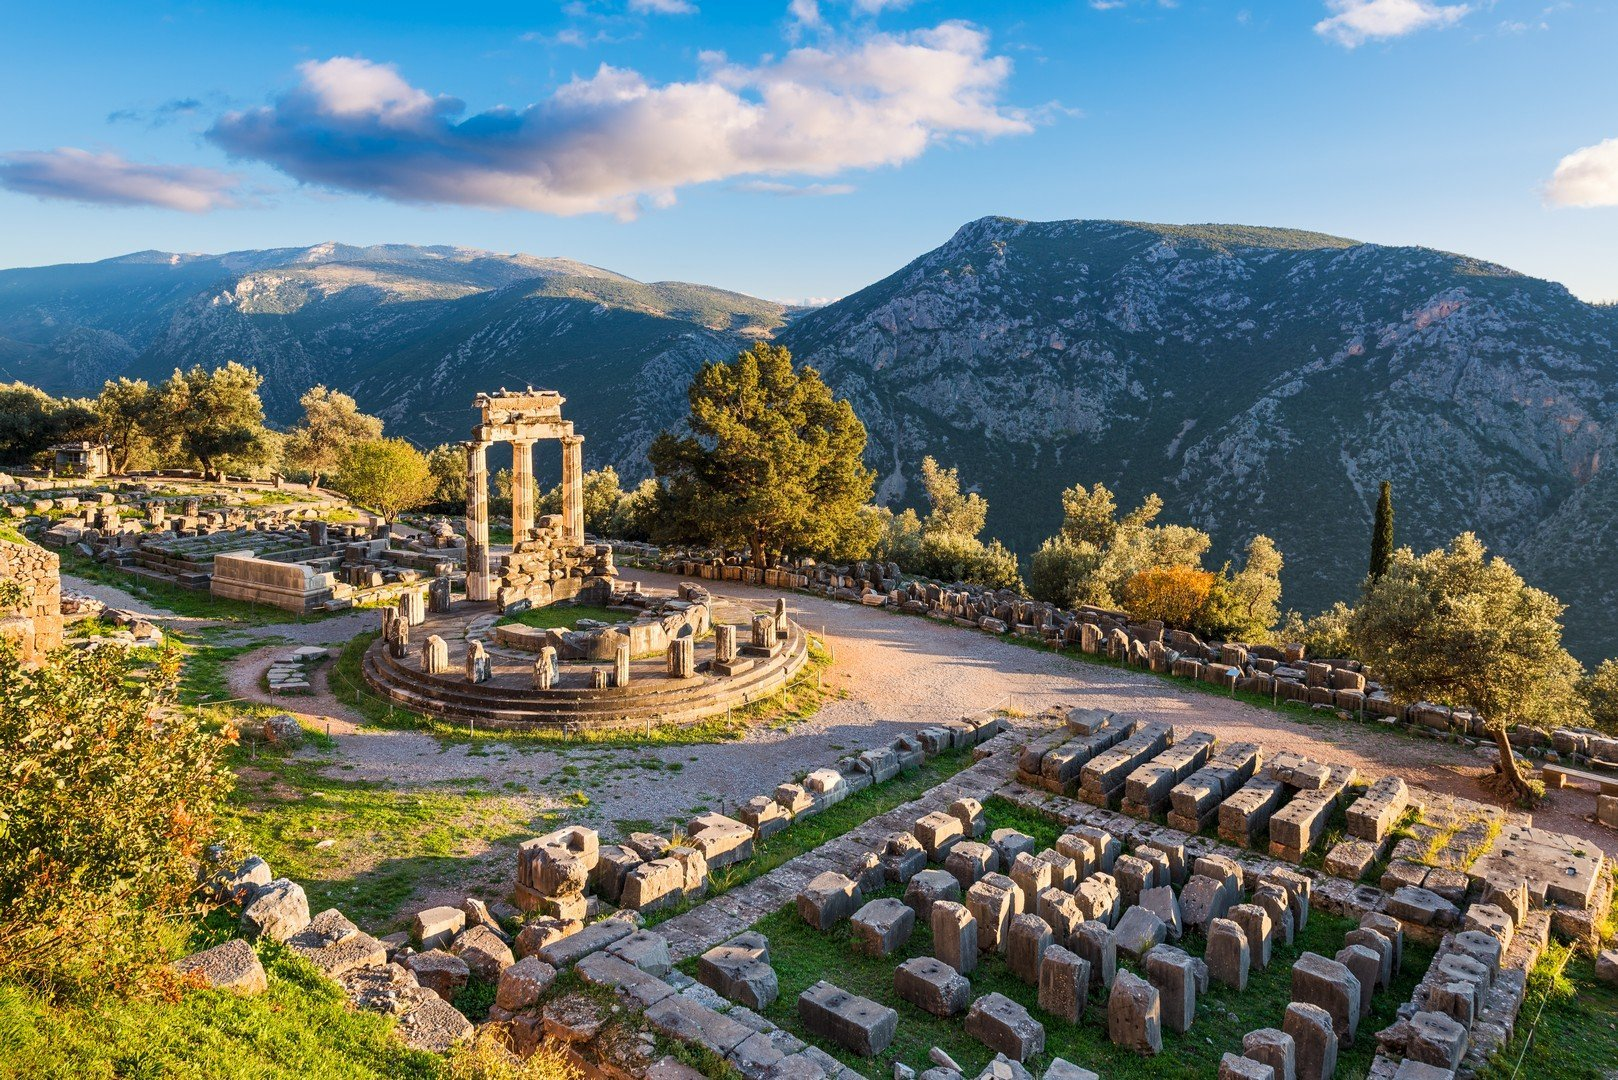 Ruins of the Temple of Athena Pronaia in ancient Delphi, Greece shutterstock_1246195618